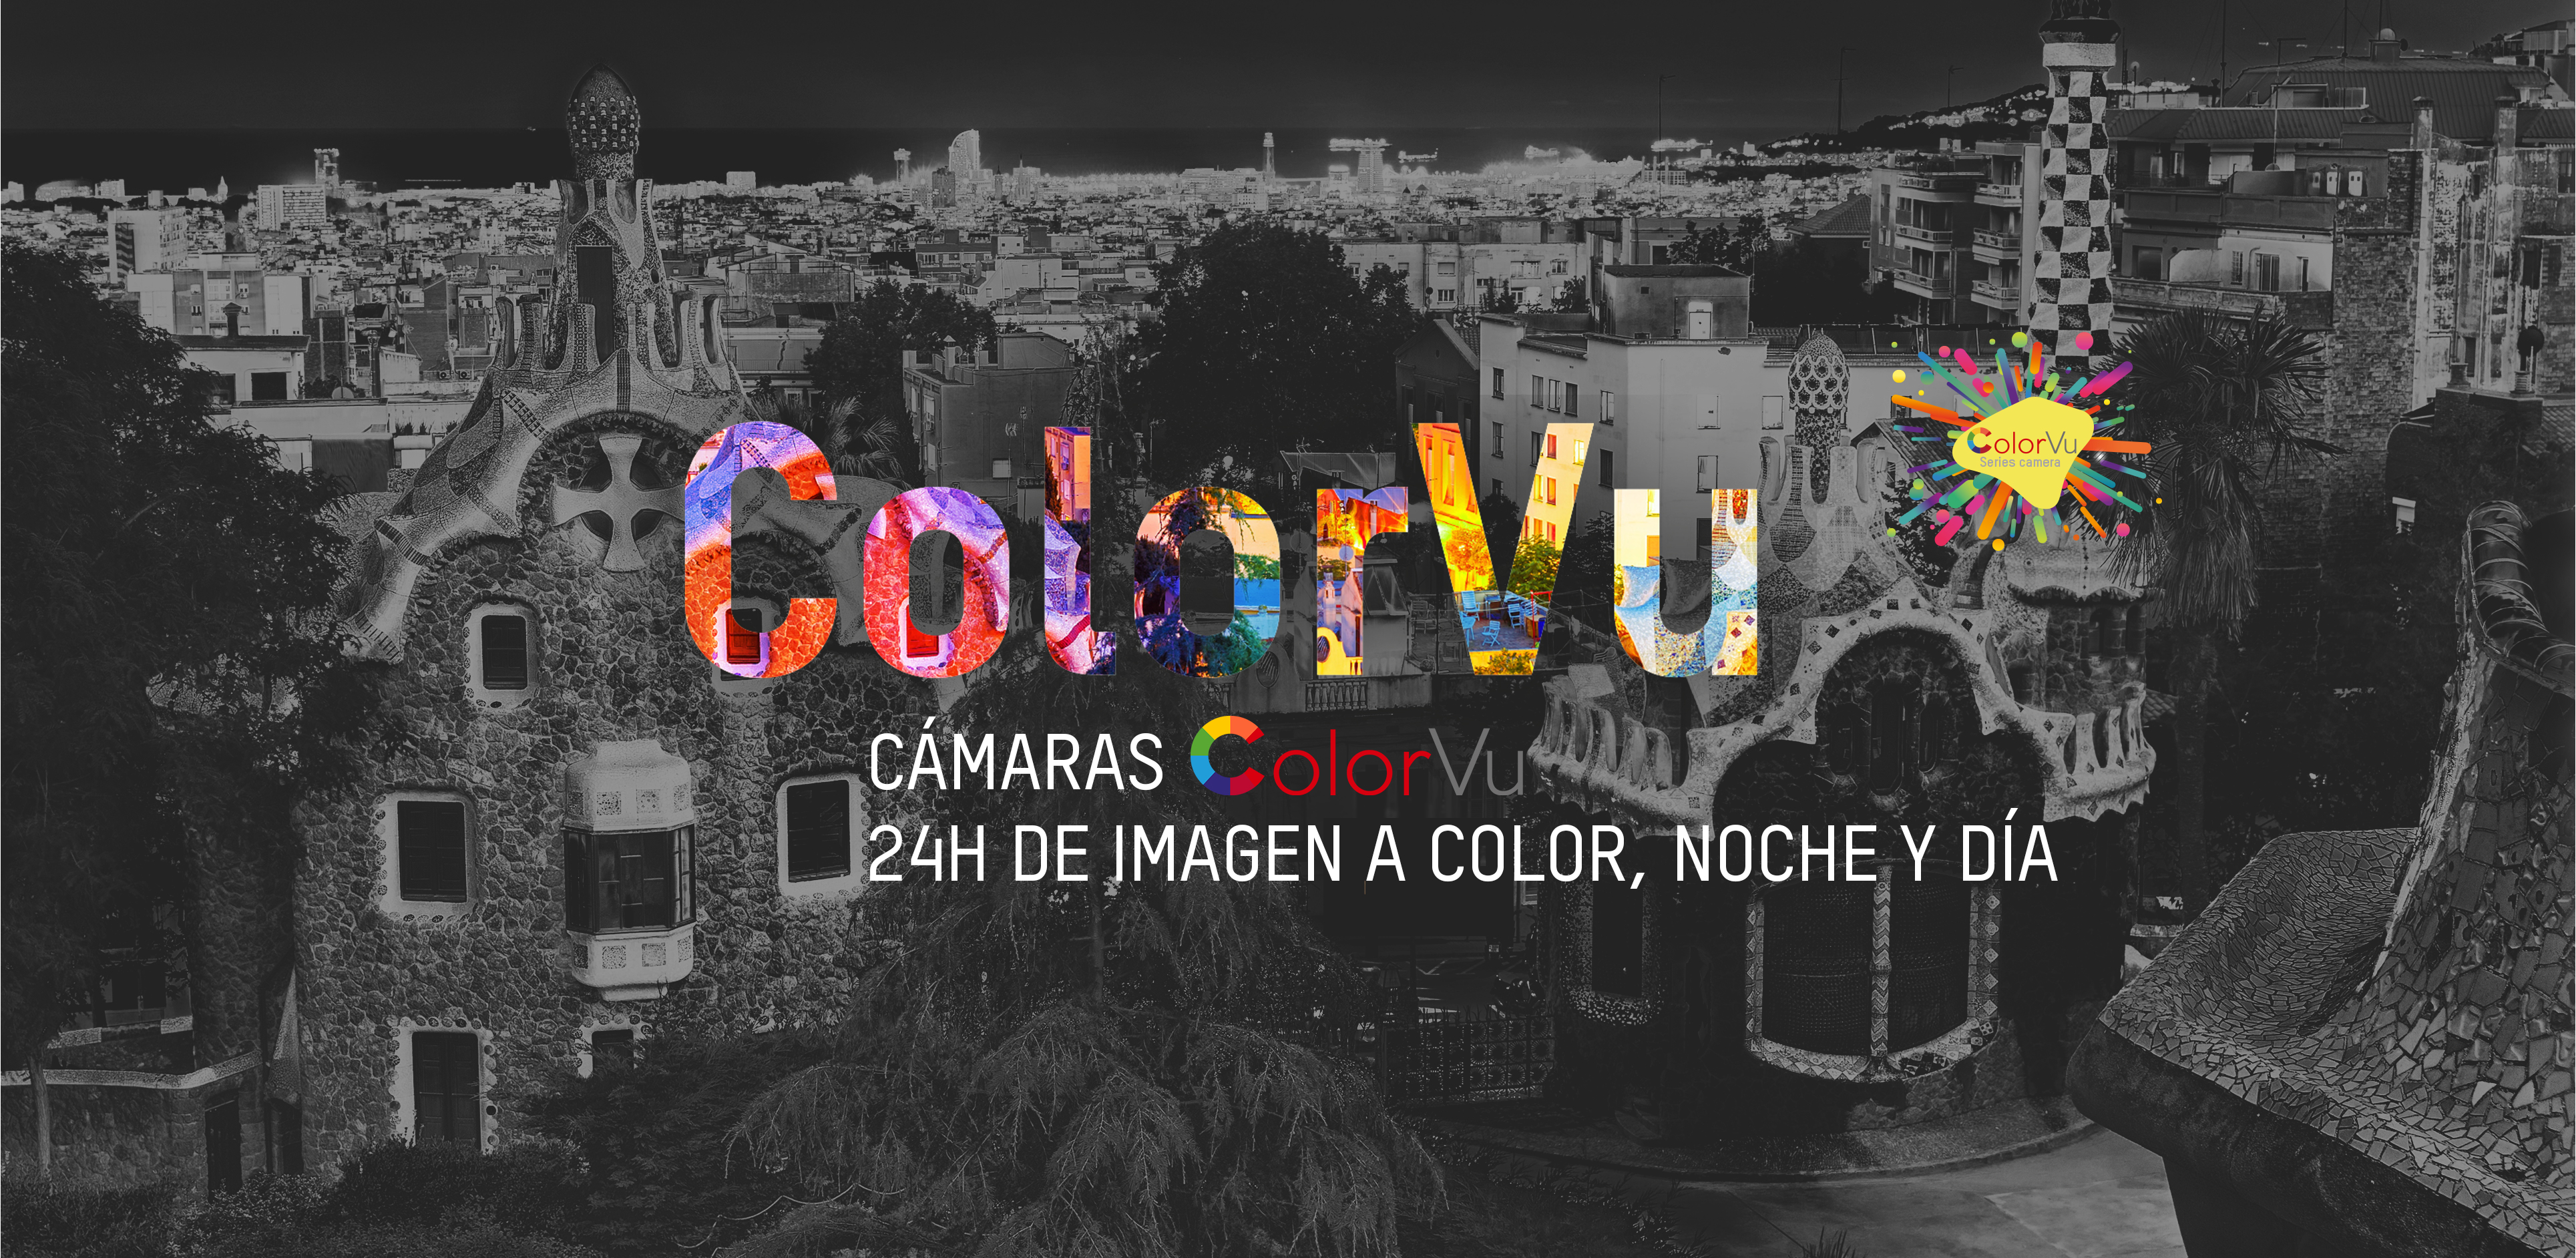 ColorVu_landing nuova4